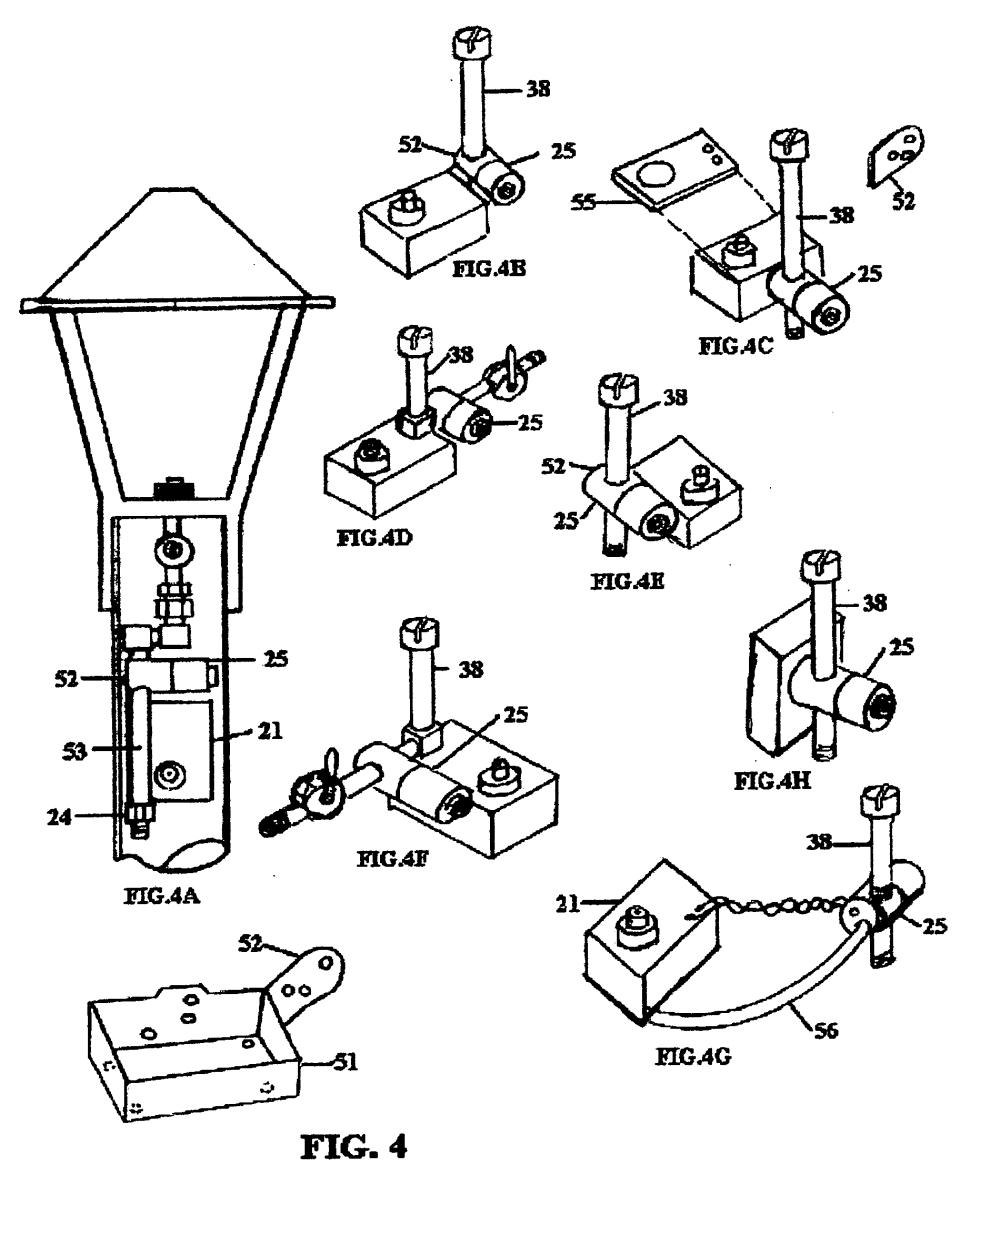 medium resolution of wiring diagram for security light pir images sensor light wiring diagram pir light wiring diagram pir